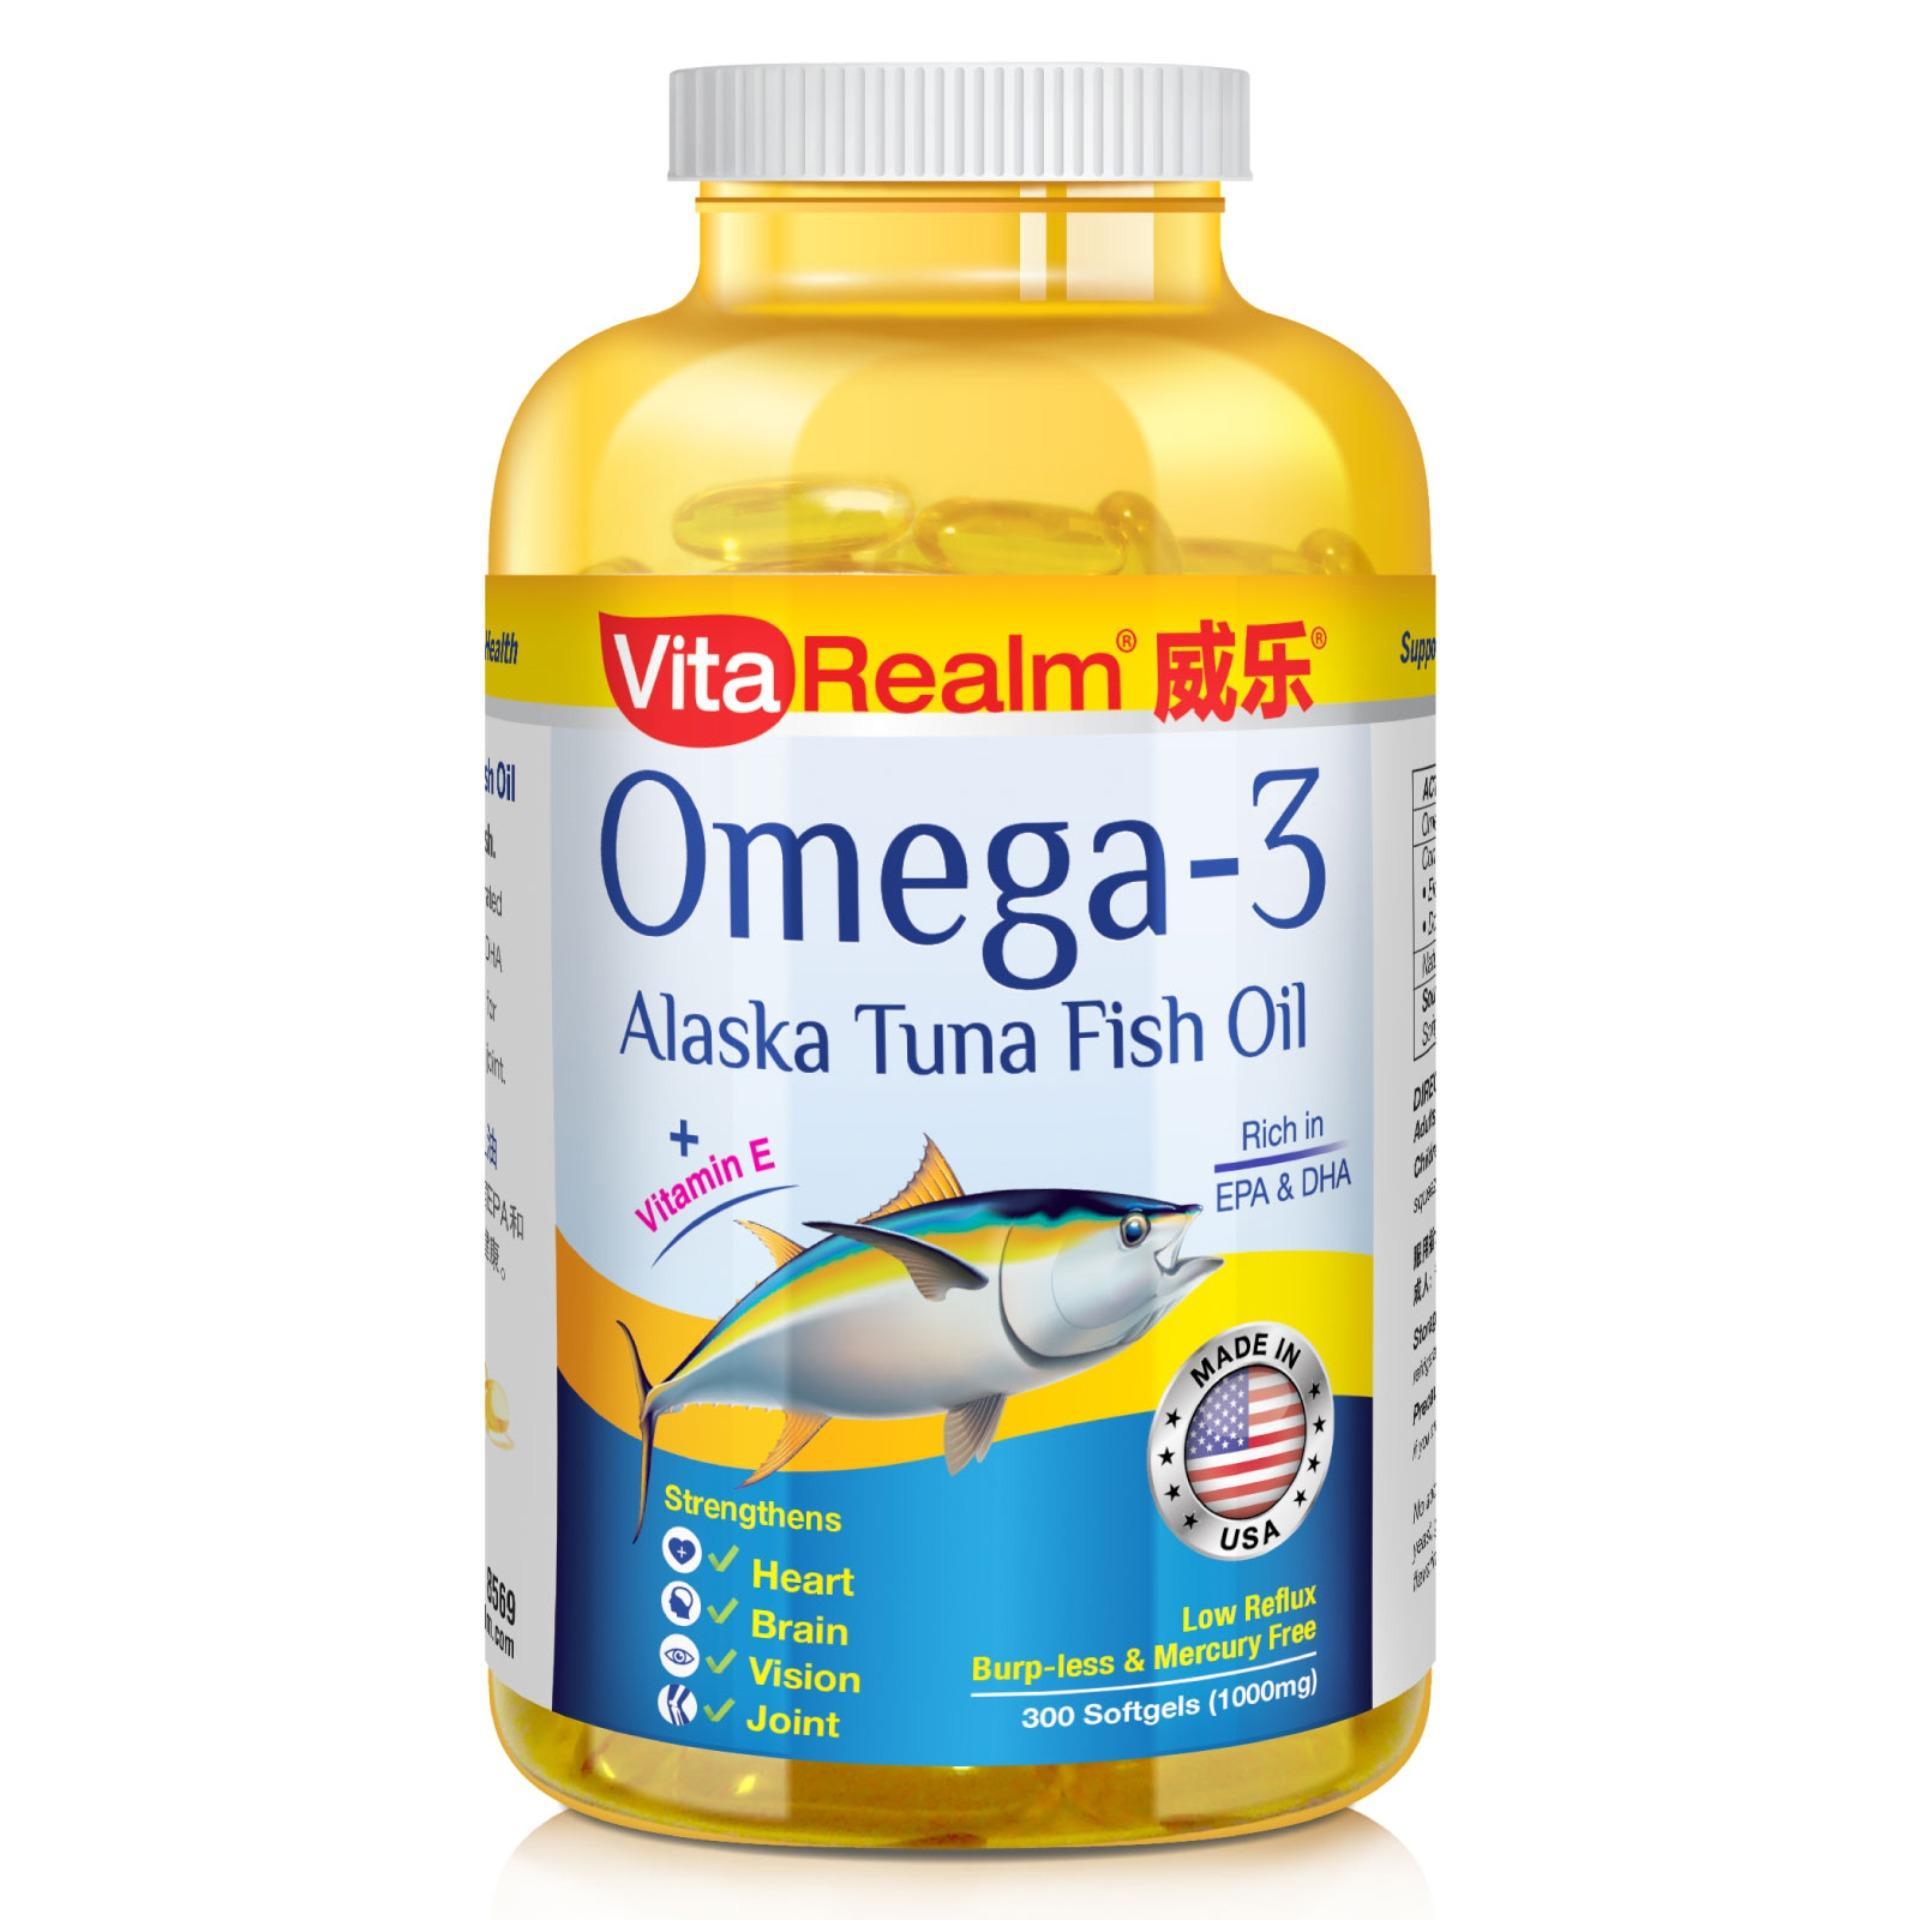 VitaRealm Extra Strength Omega-3 Alaska Tuna Fish Oil